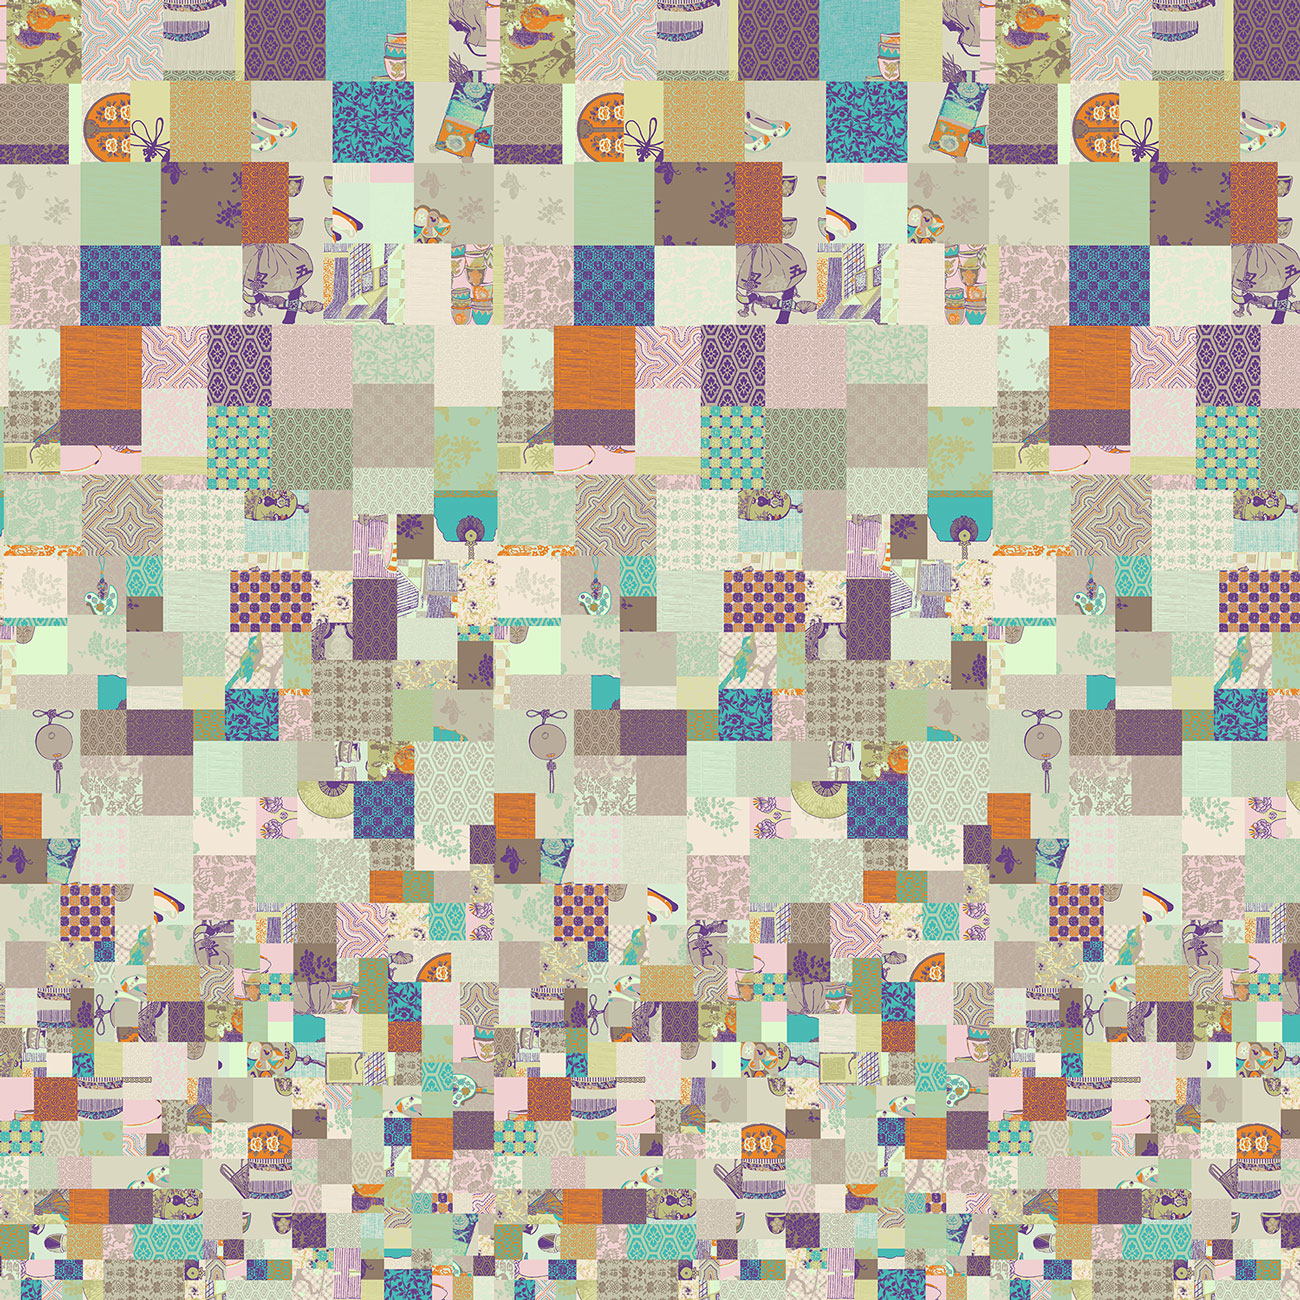 Jogak-iki_pixel